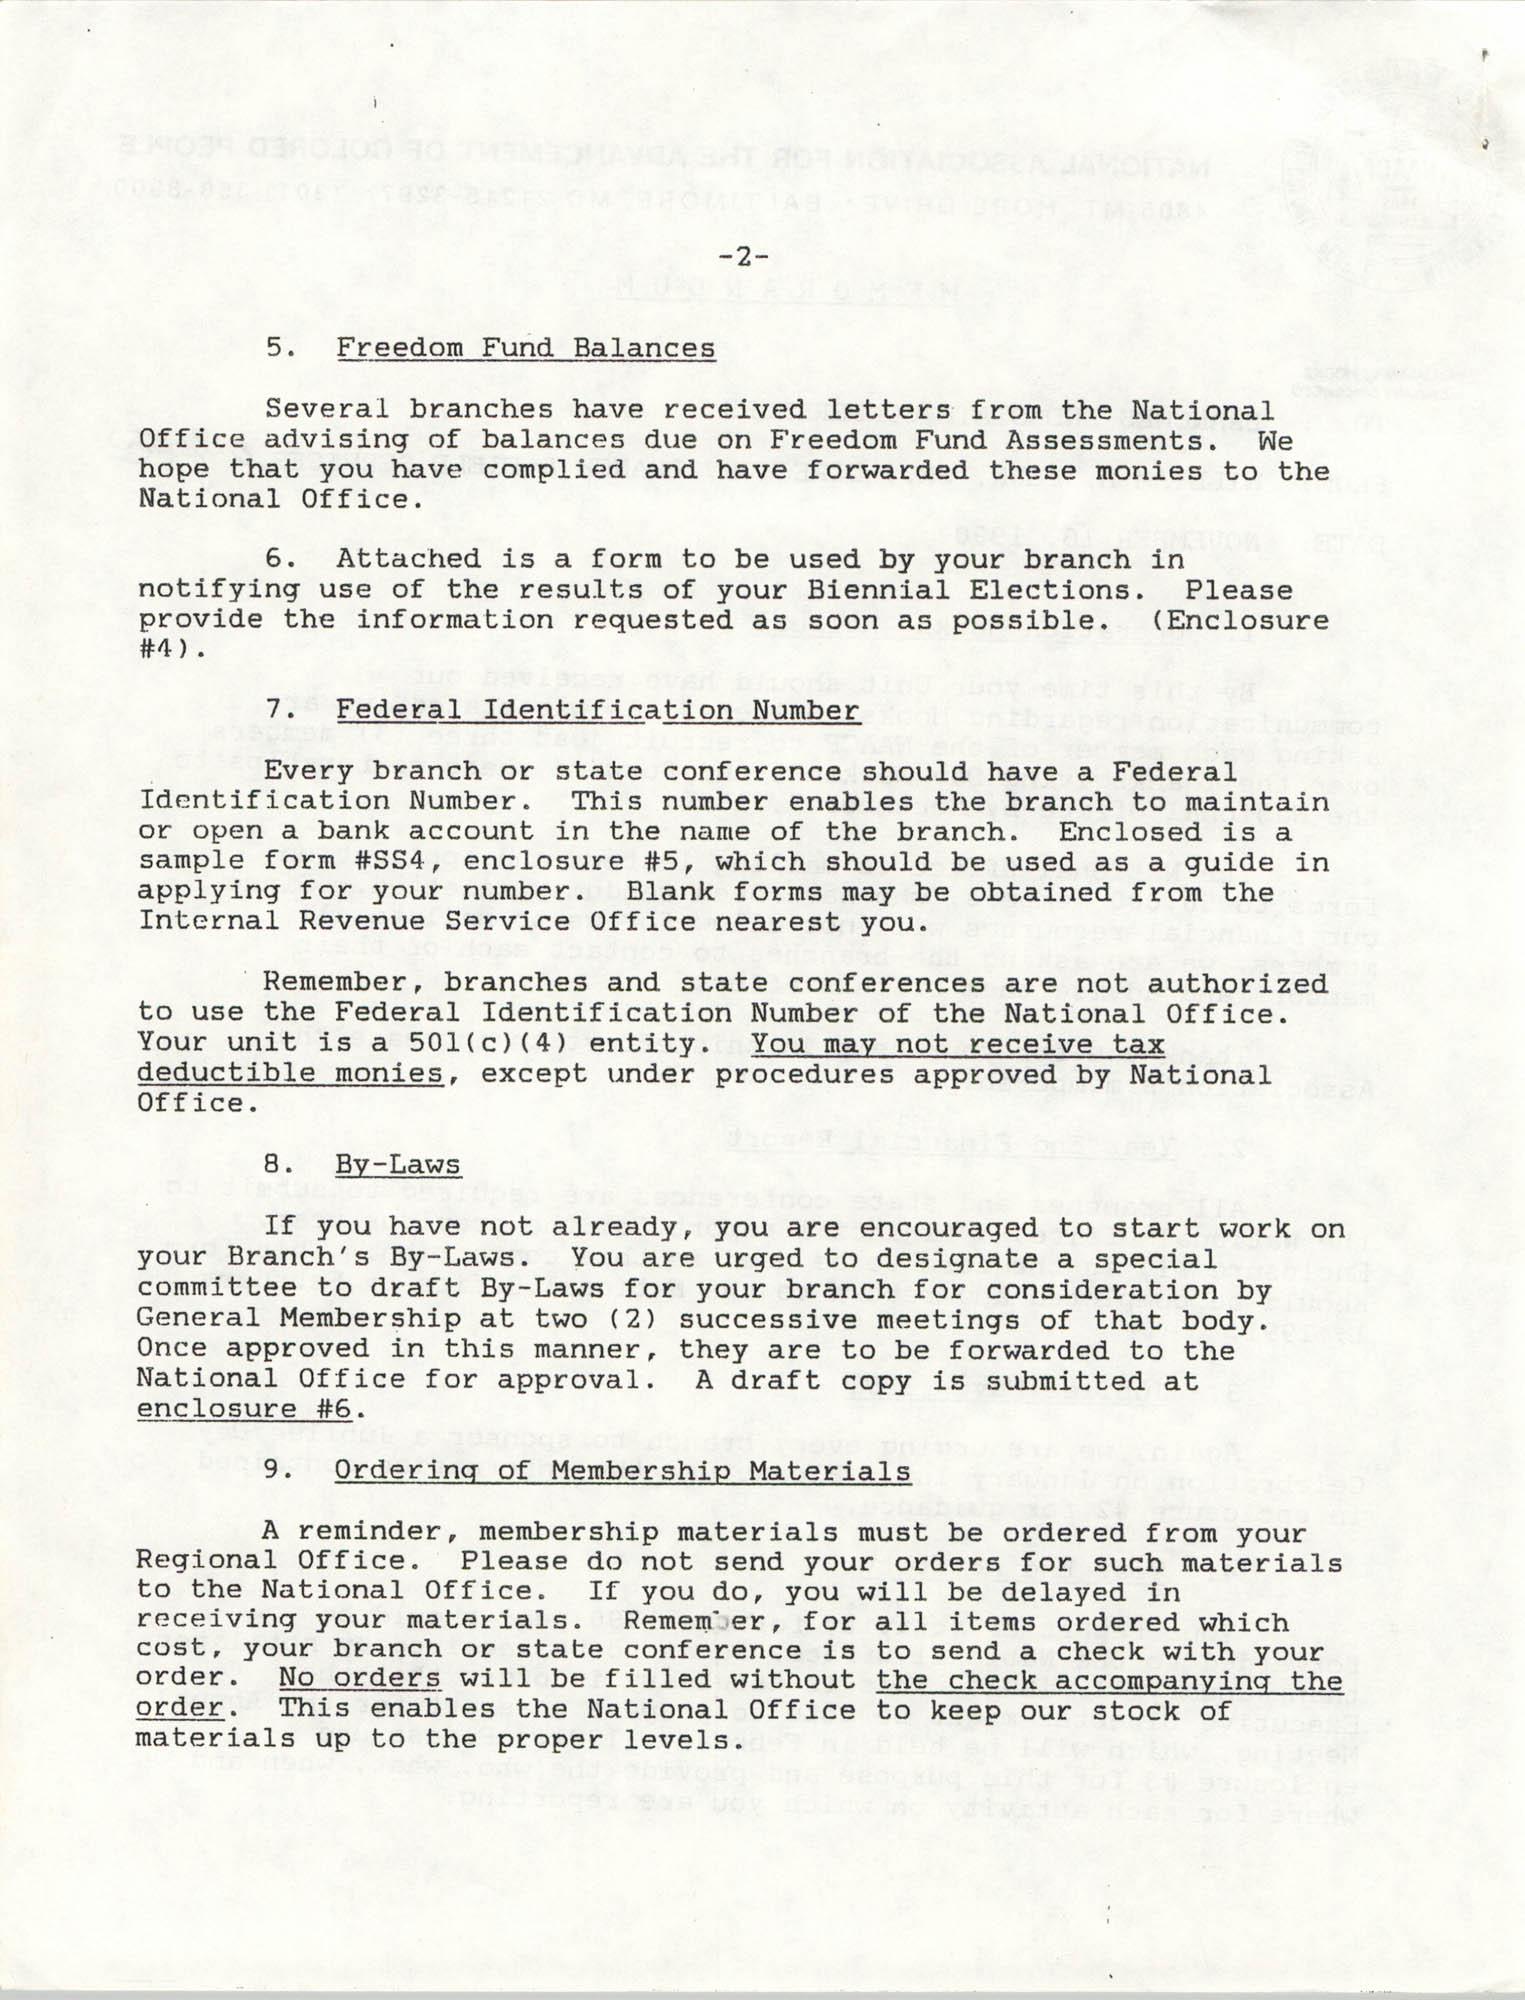 NAACP Memorandum, November 16, 1990, Page 1